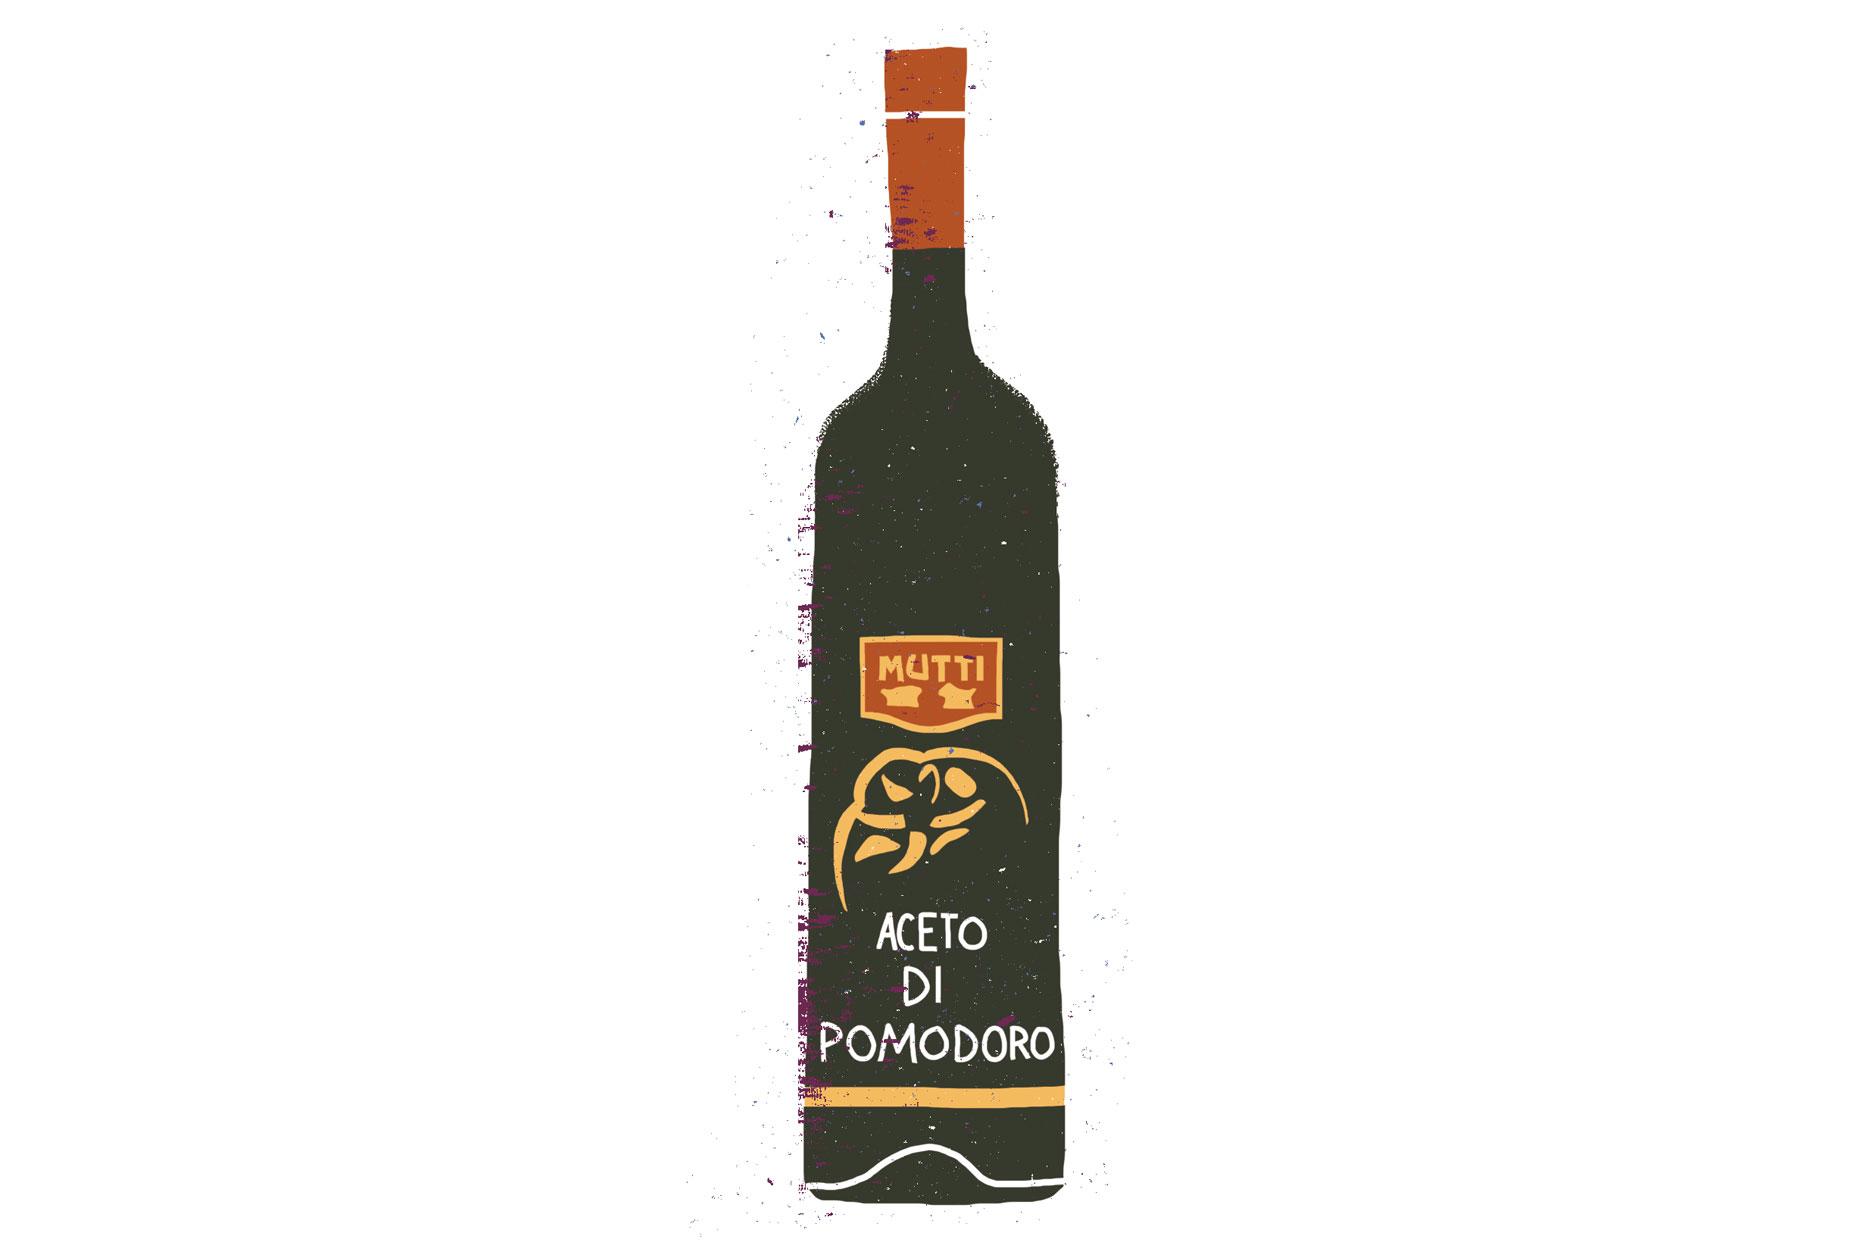 Mutti Tomato Vinegar bottle illustration